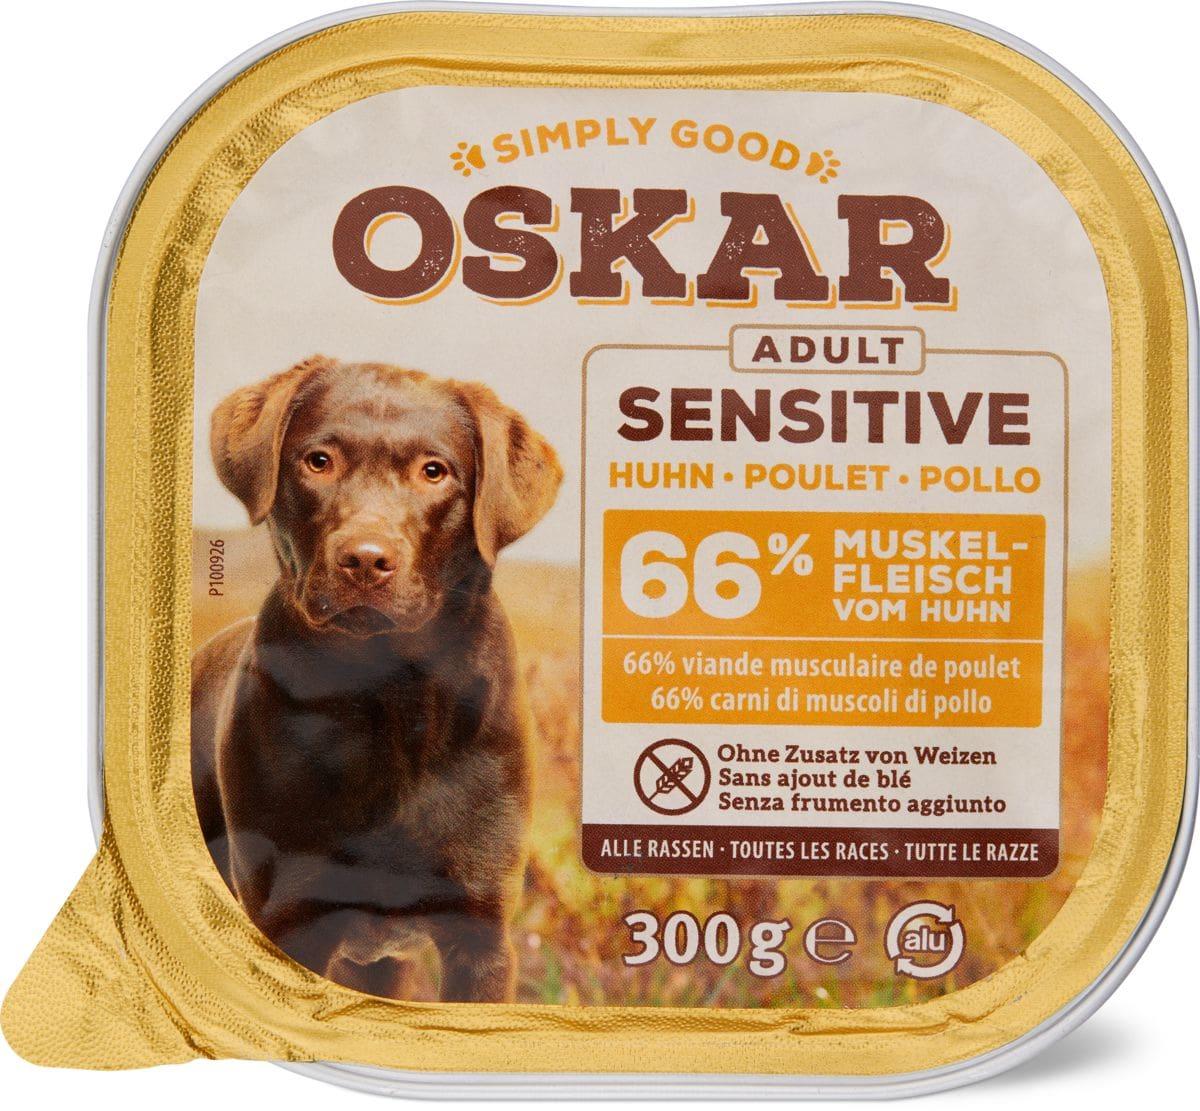 Oskar Sensitive poulet